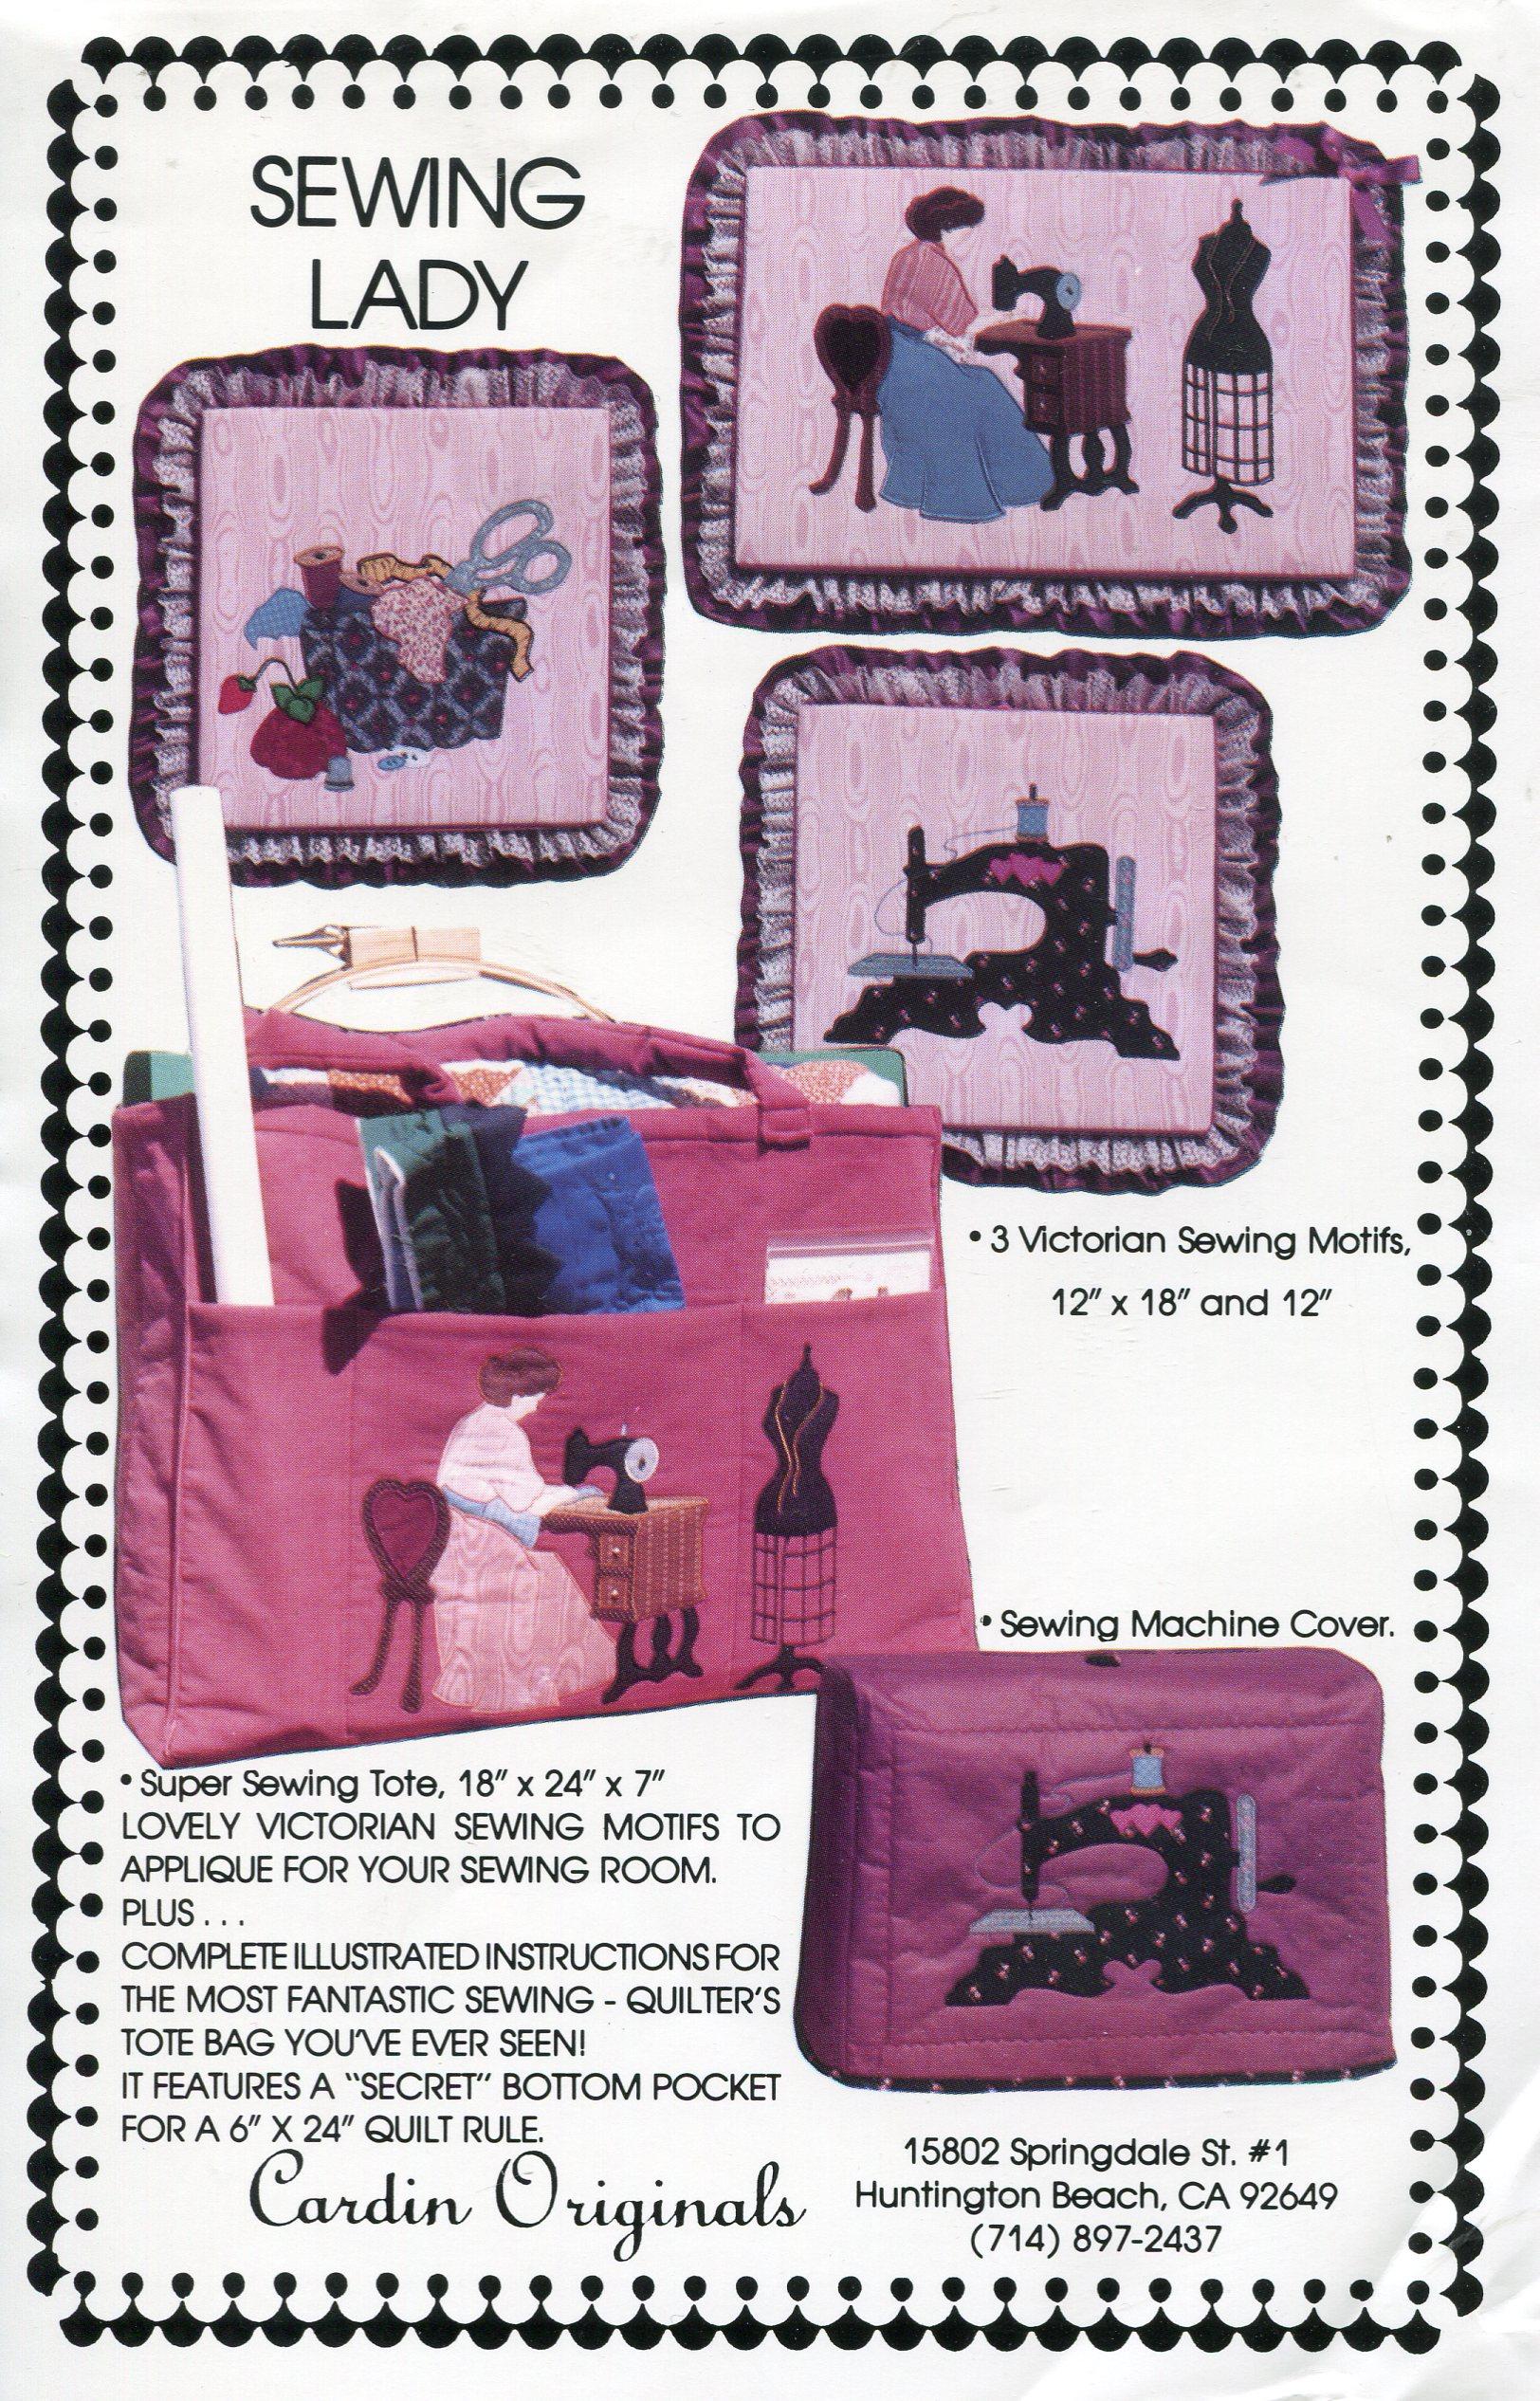 Cardin Originals Sewing Lady